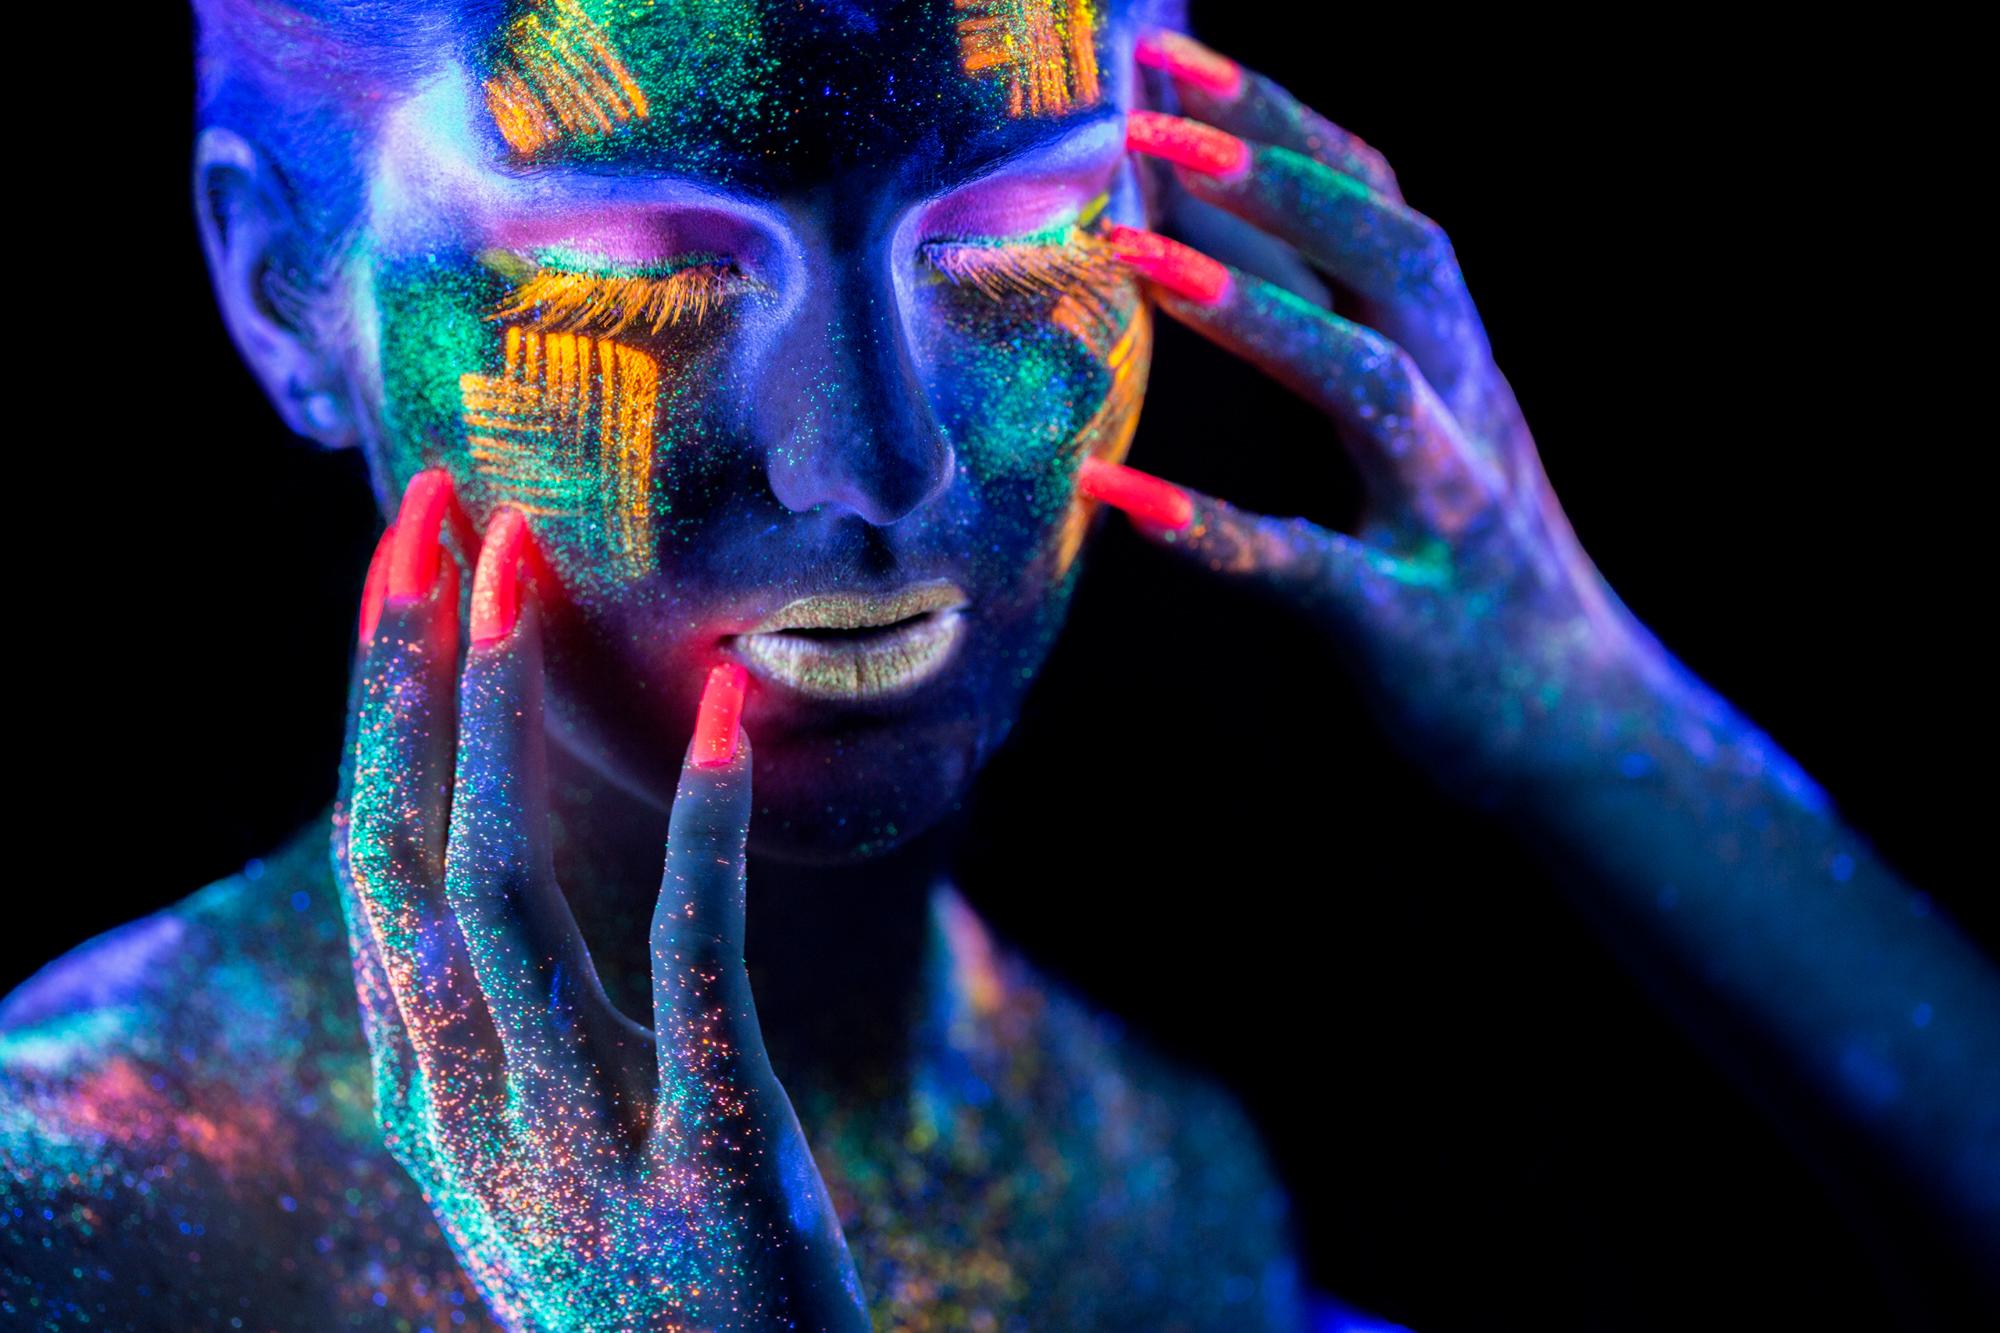 Vincent-Australis-Fashion-Photographer-Adamczyk-Ophelie-mua-Sandy-Mantovani